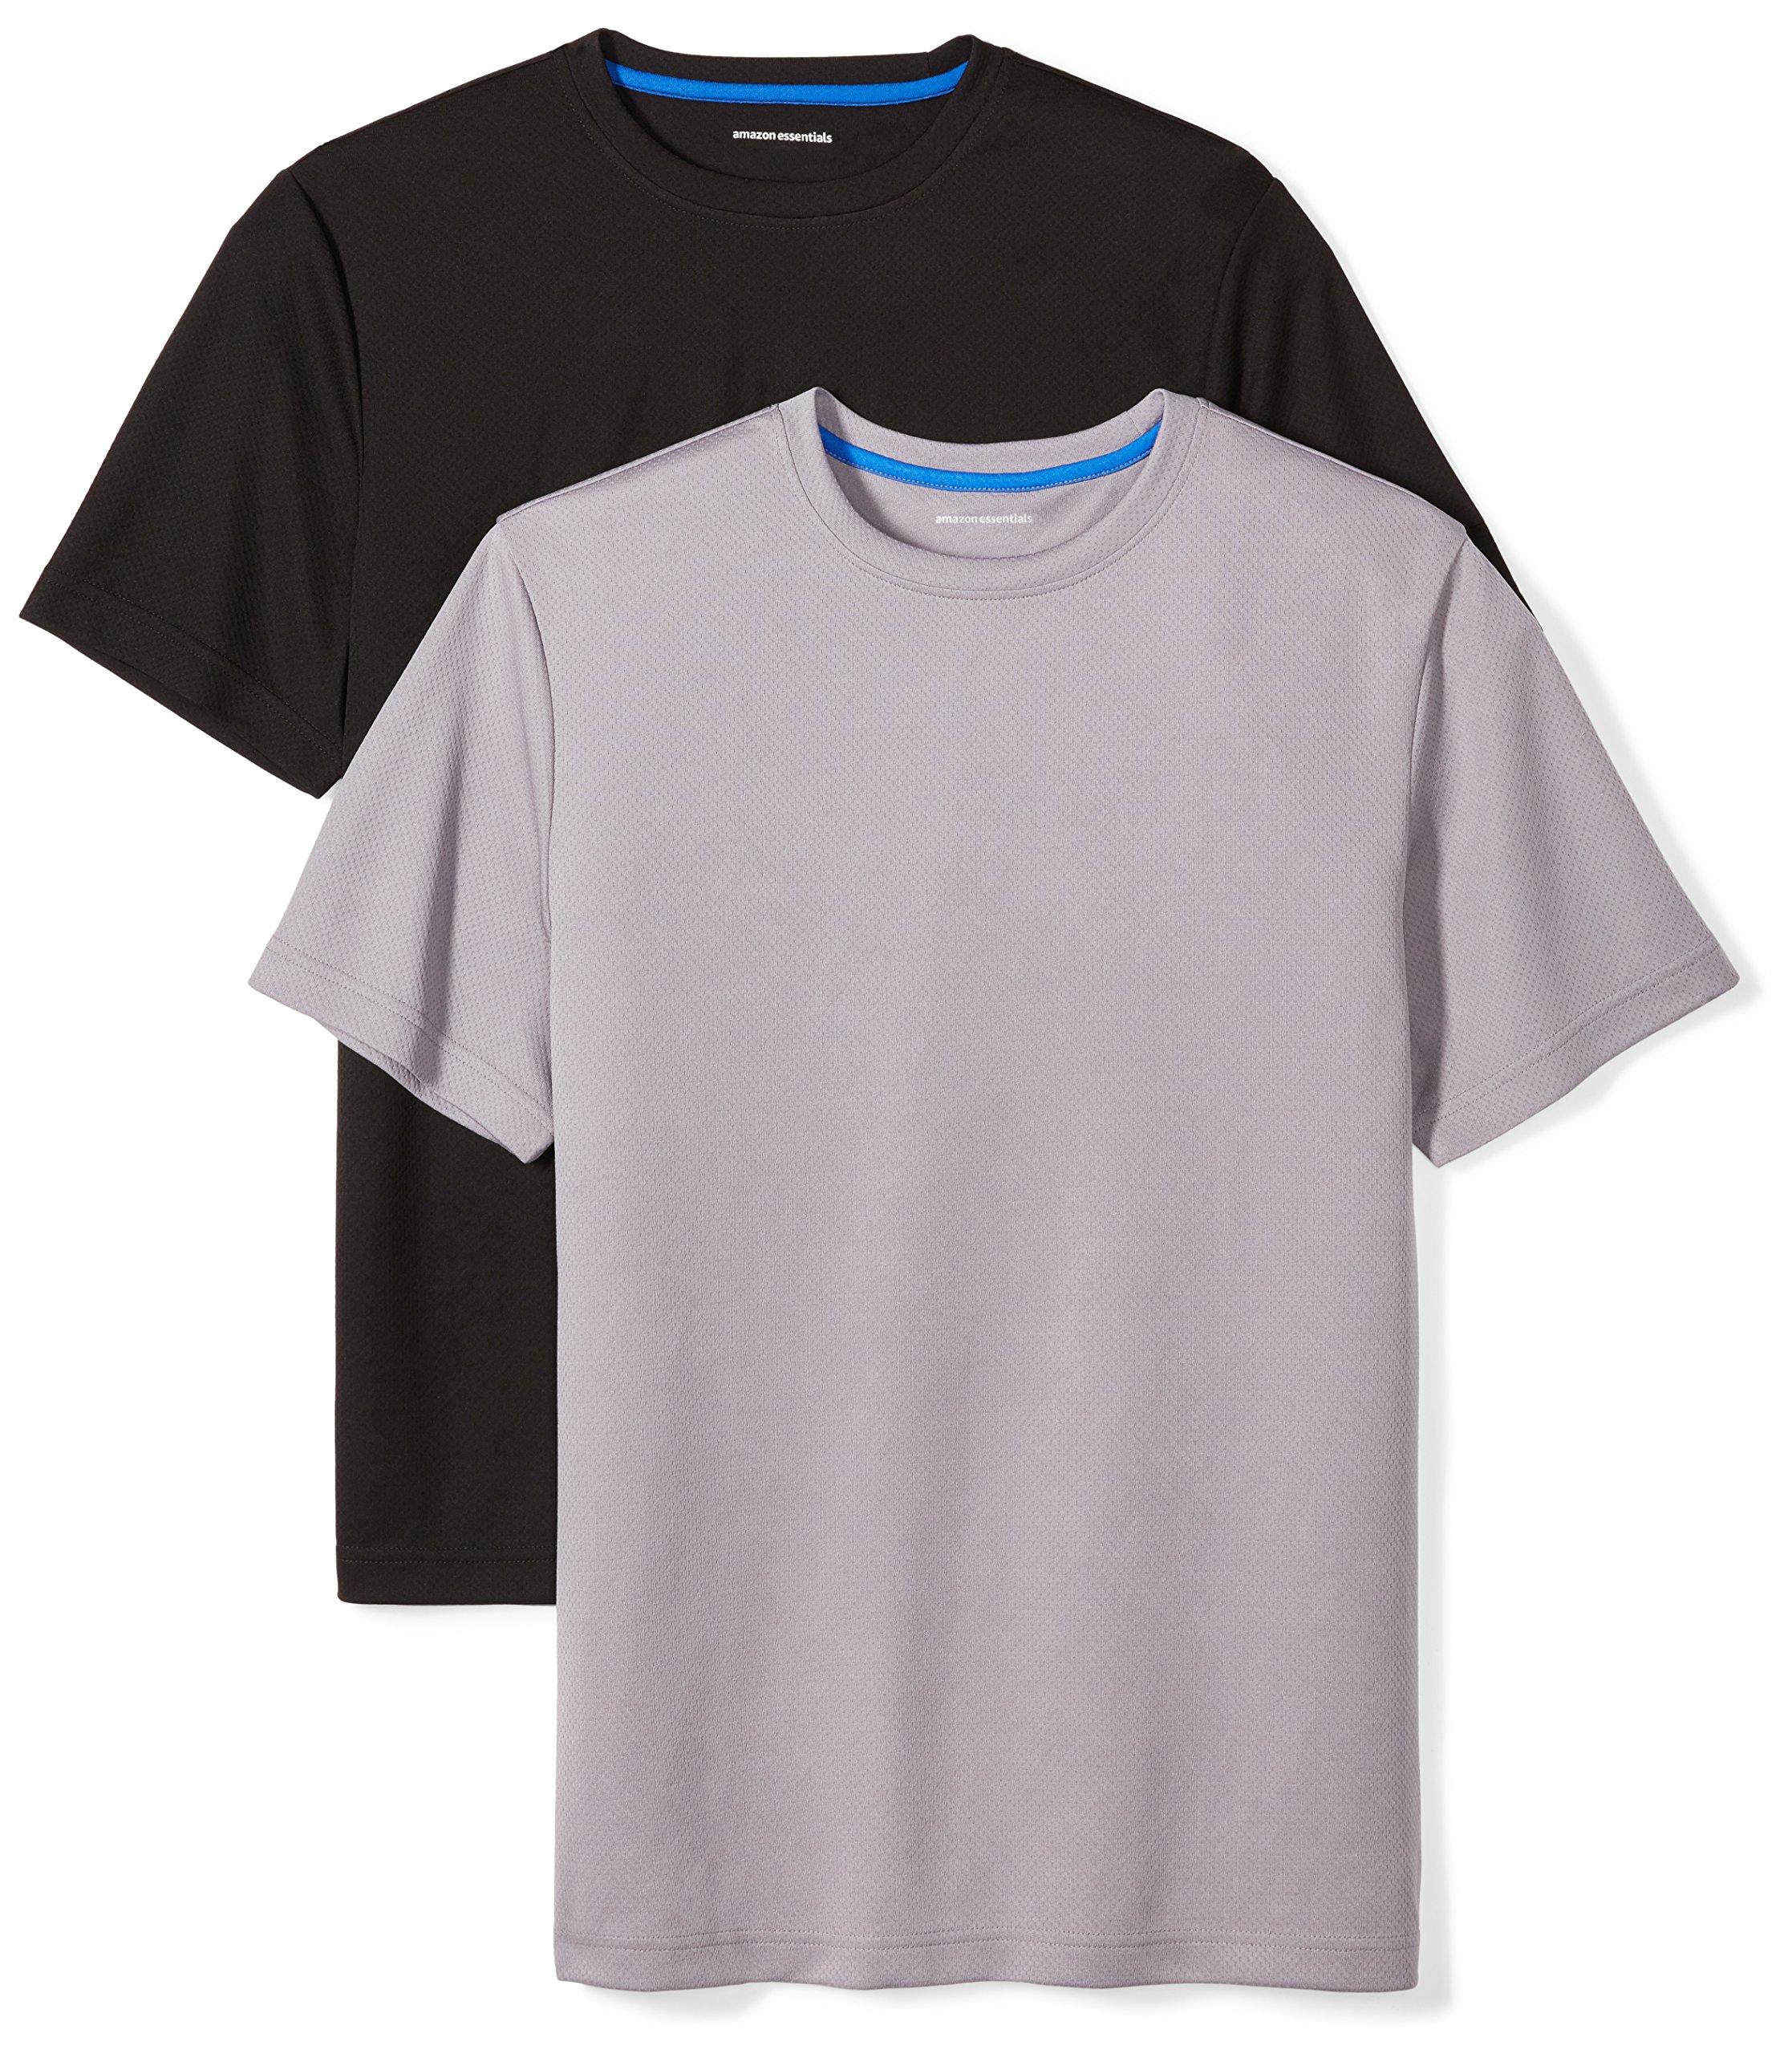 Amazon Essentials Men's 2-Pack Performance Short-Sleeve T-Shirts, Black/Medium Grey, Large